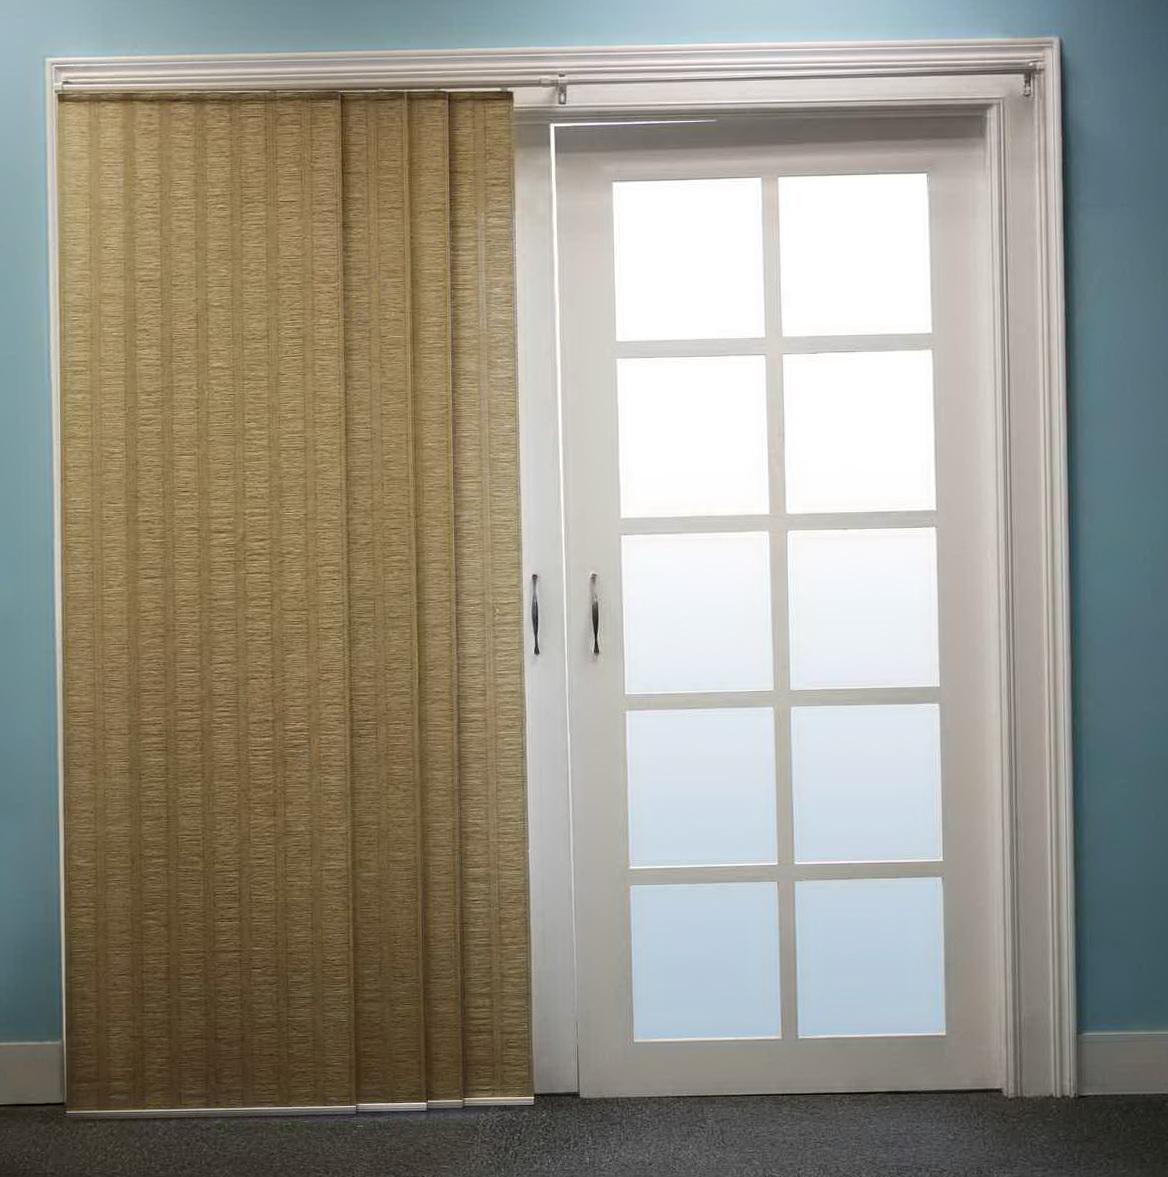 Sliding Panel Curtains Home Depot